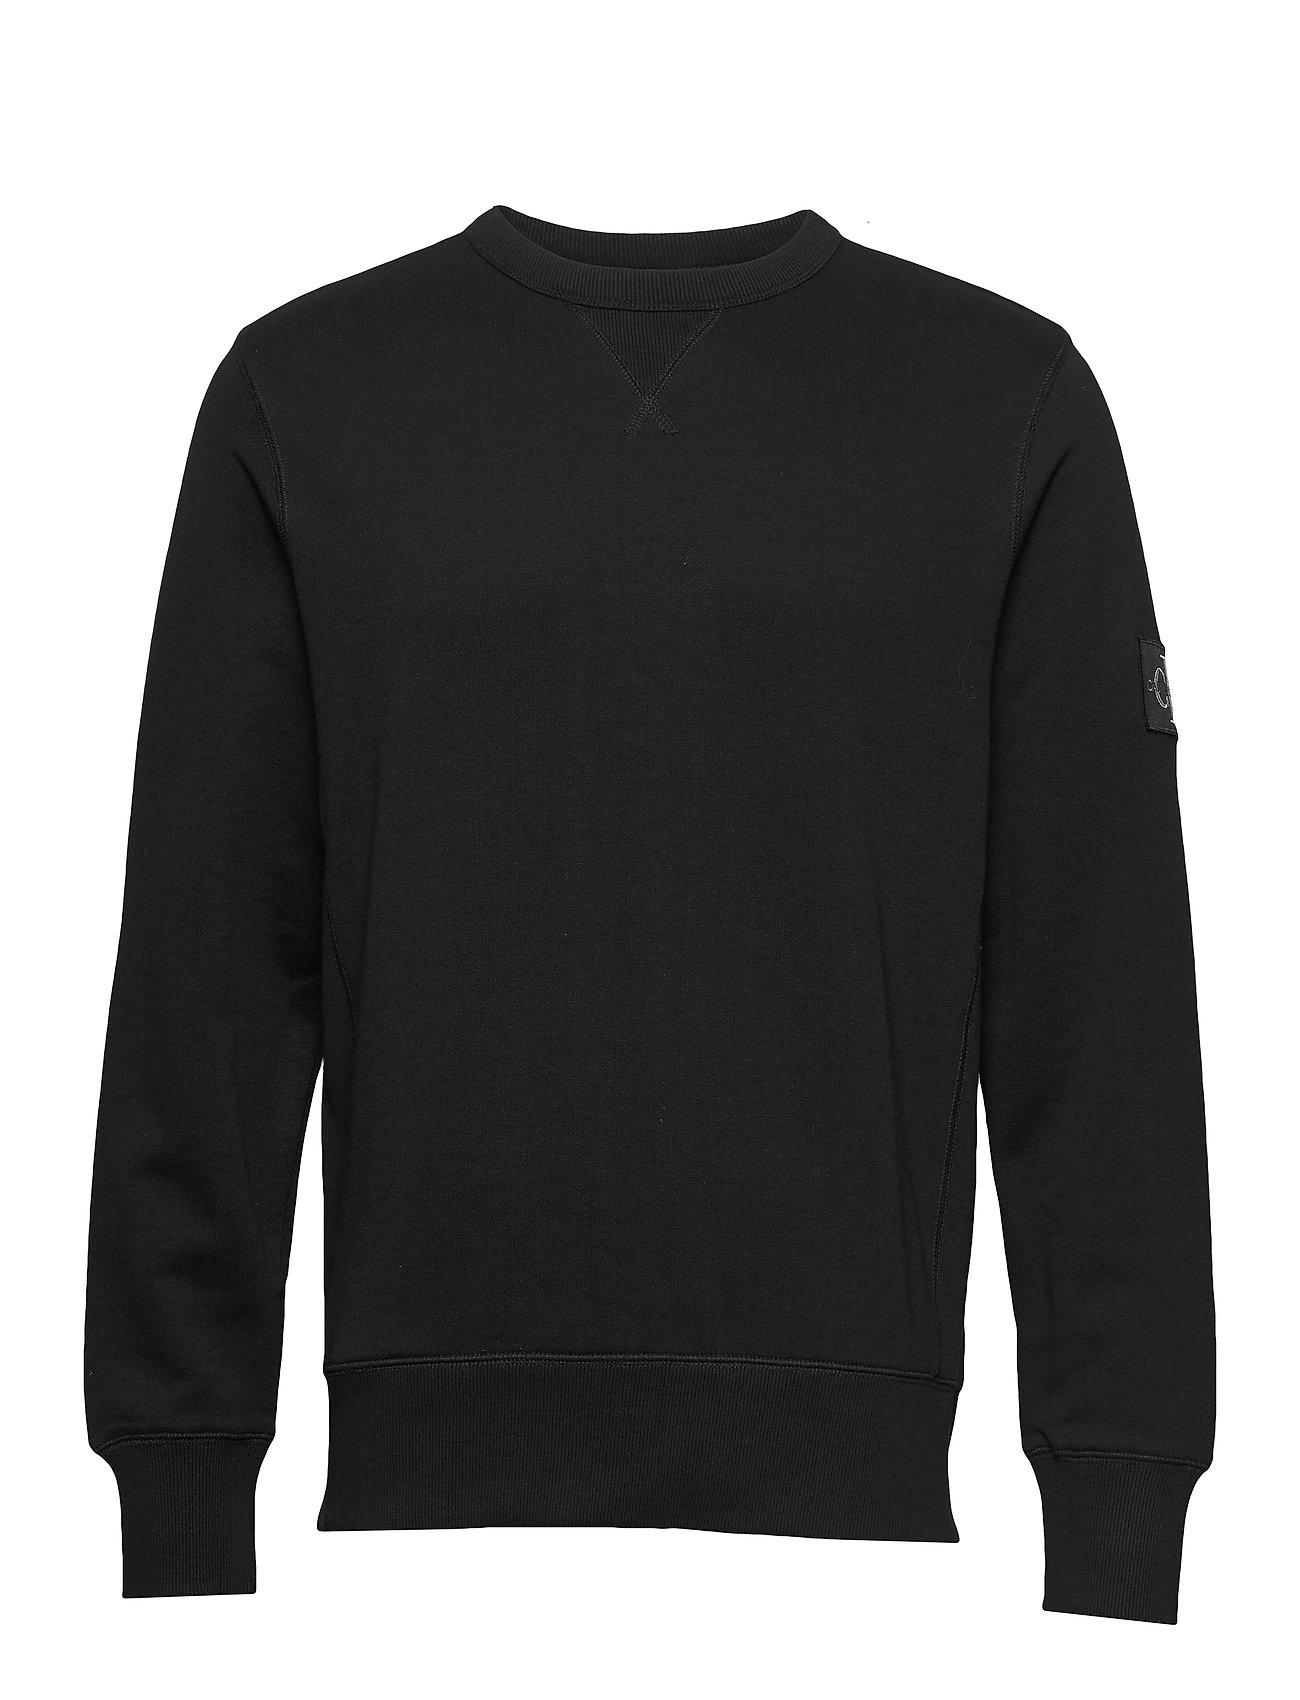 Calvin Klein Jeans MONOGRAM SLEEVE BADGE CN - CK BLACK